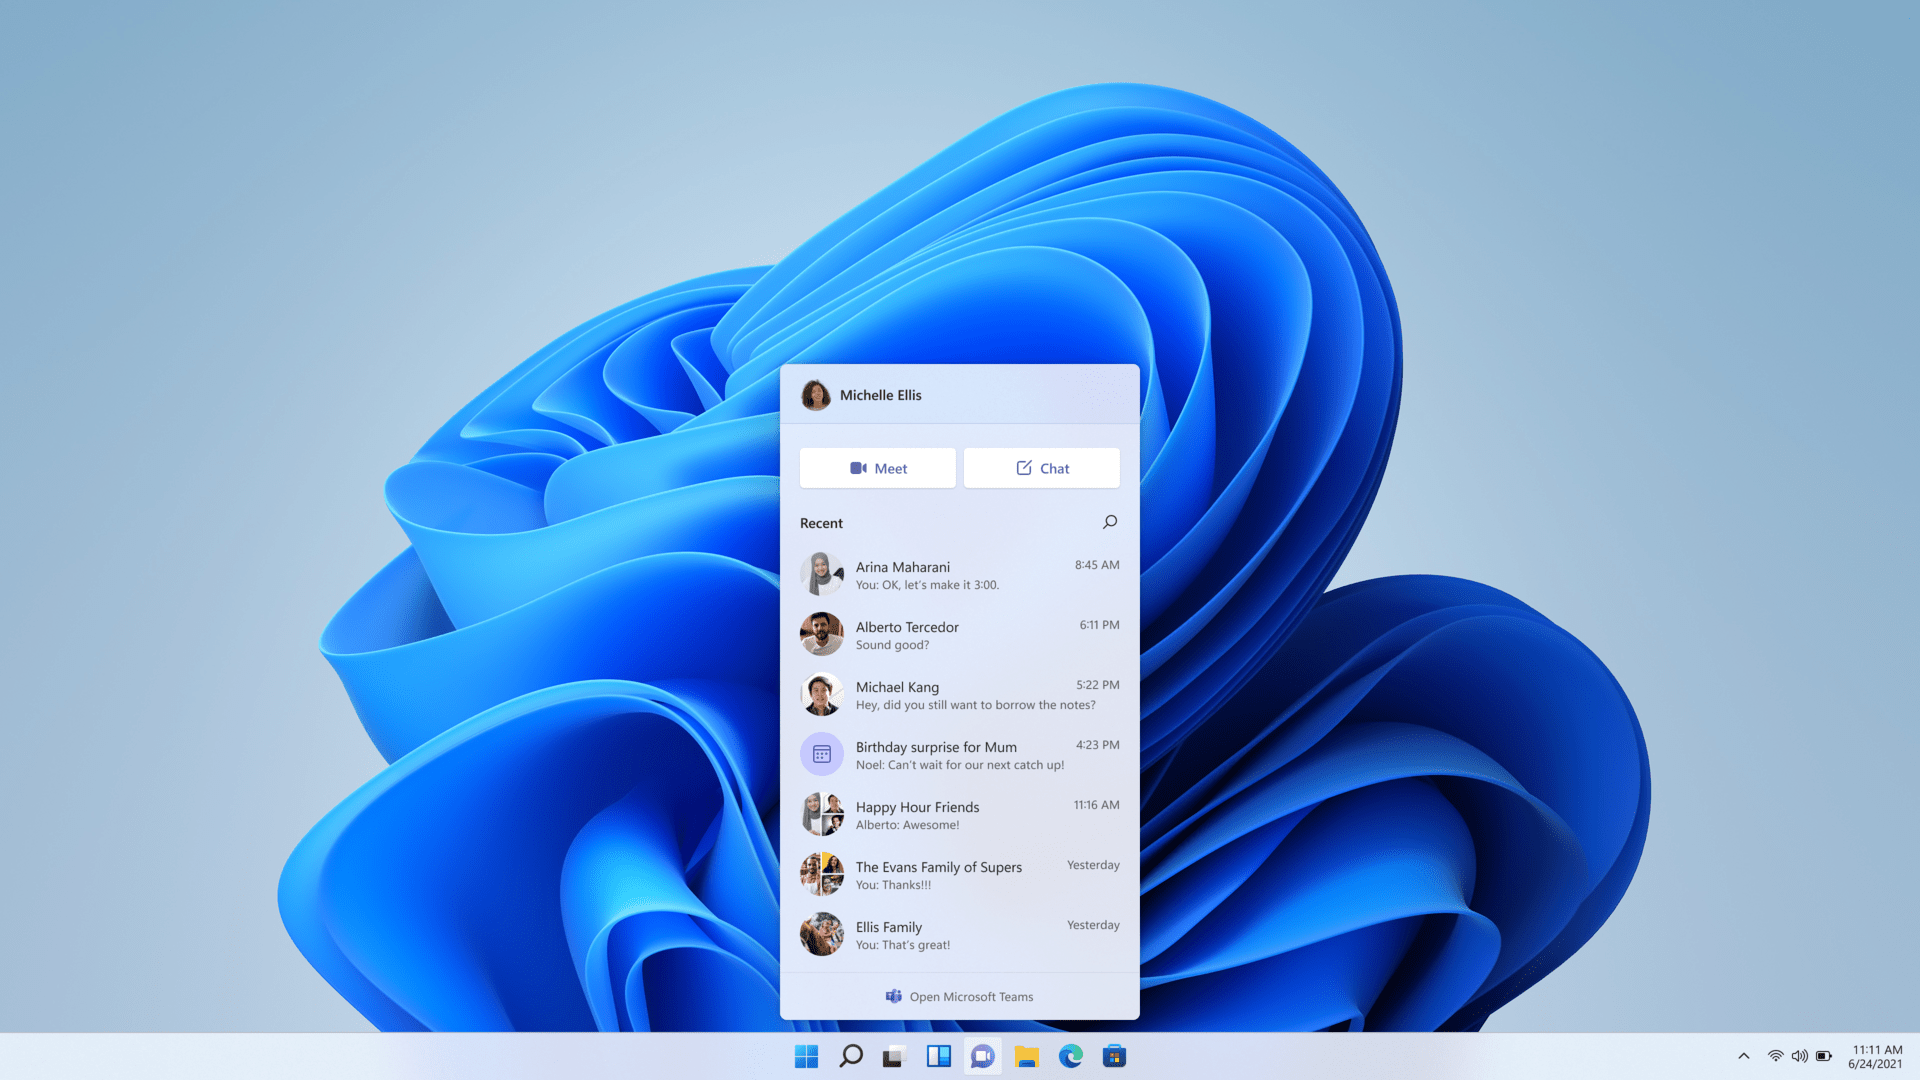 Windows 11 – Microsoft Teams